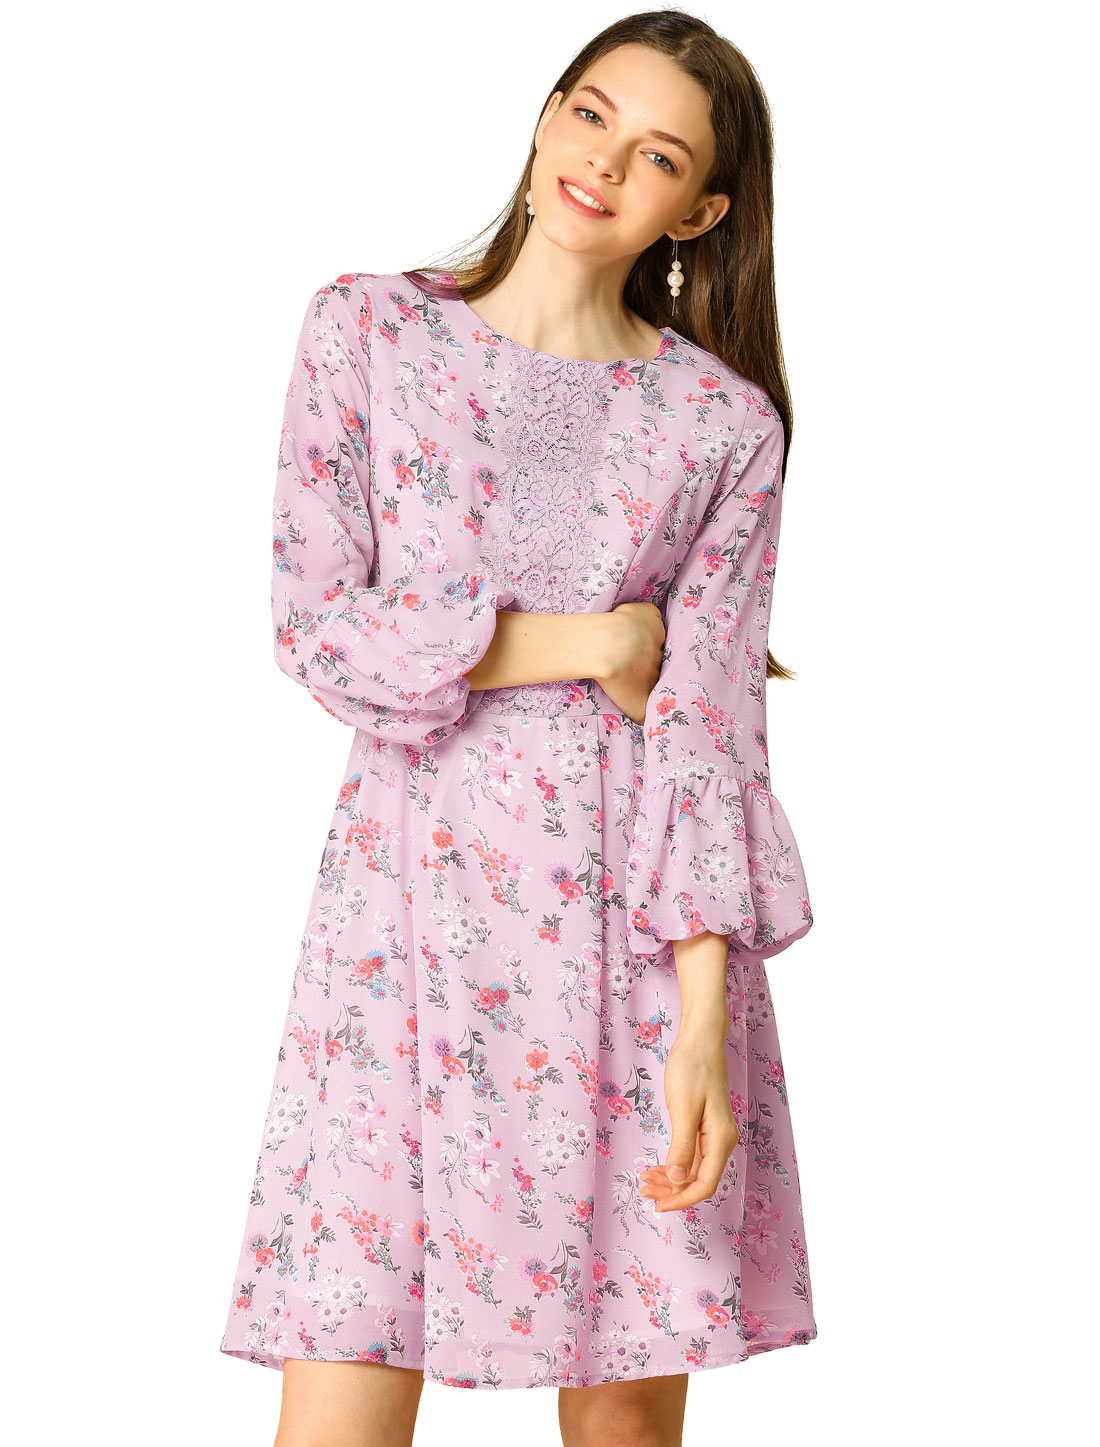 Women's Vintage Lantern Sleeves Lace Splice Chiffon Floral Flare Dress Purple S